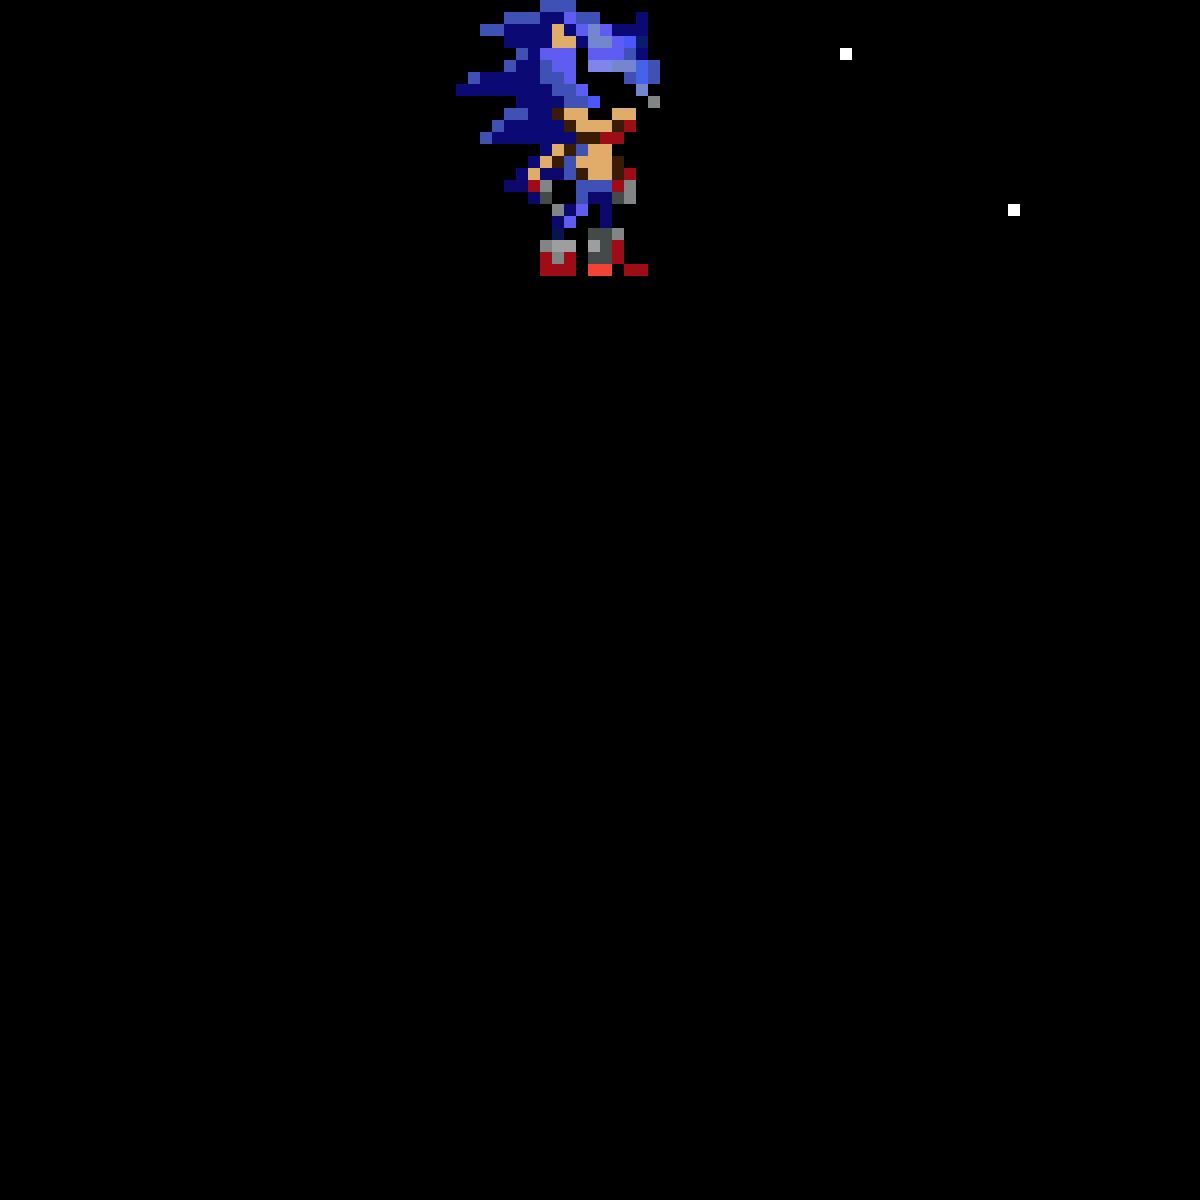 Pixilart Sonic The Hedgehog Pixel Art Finished I Tried By Rentokusama